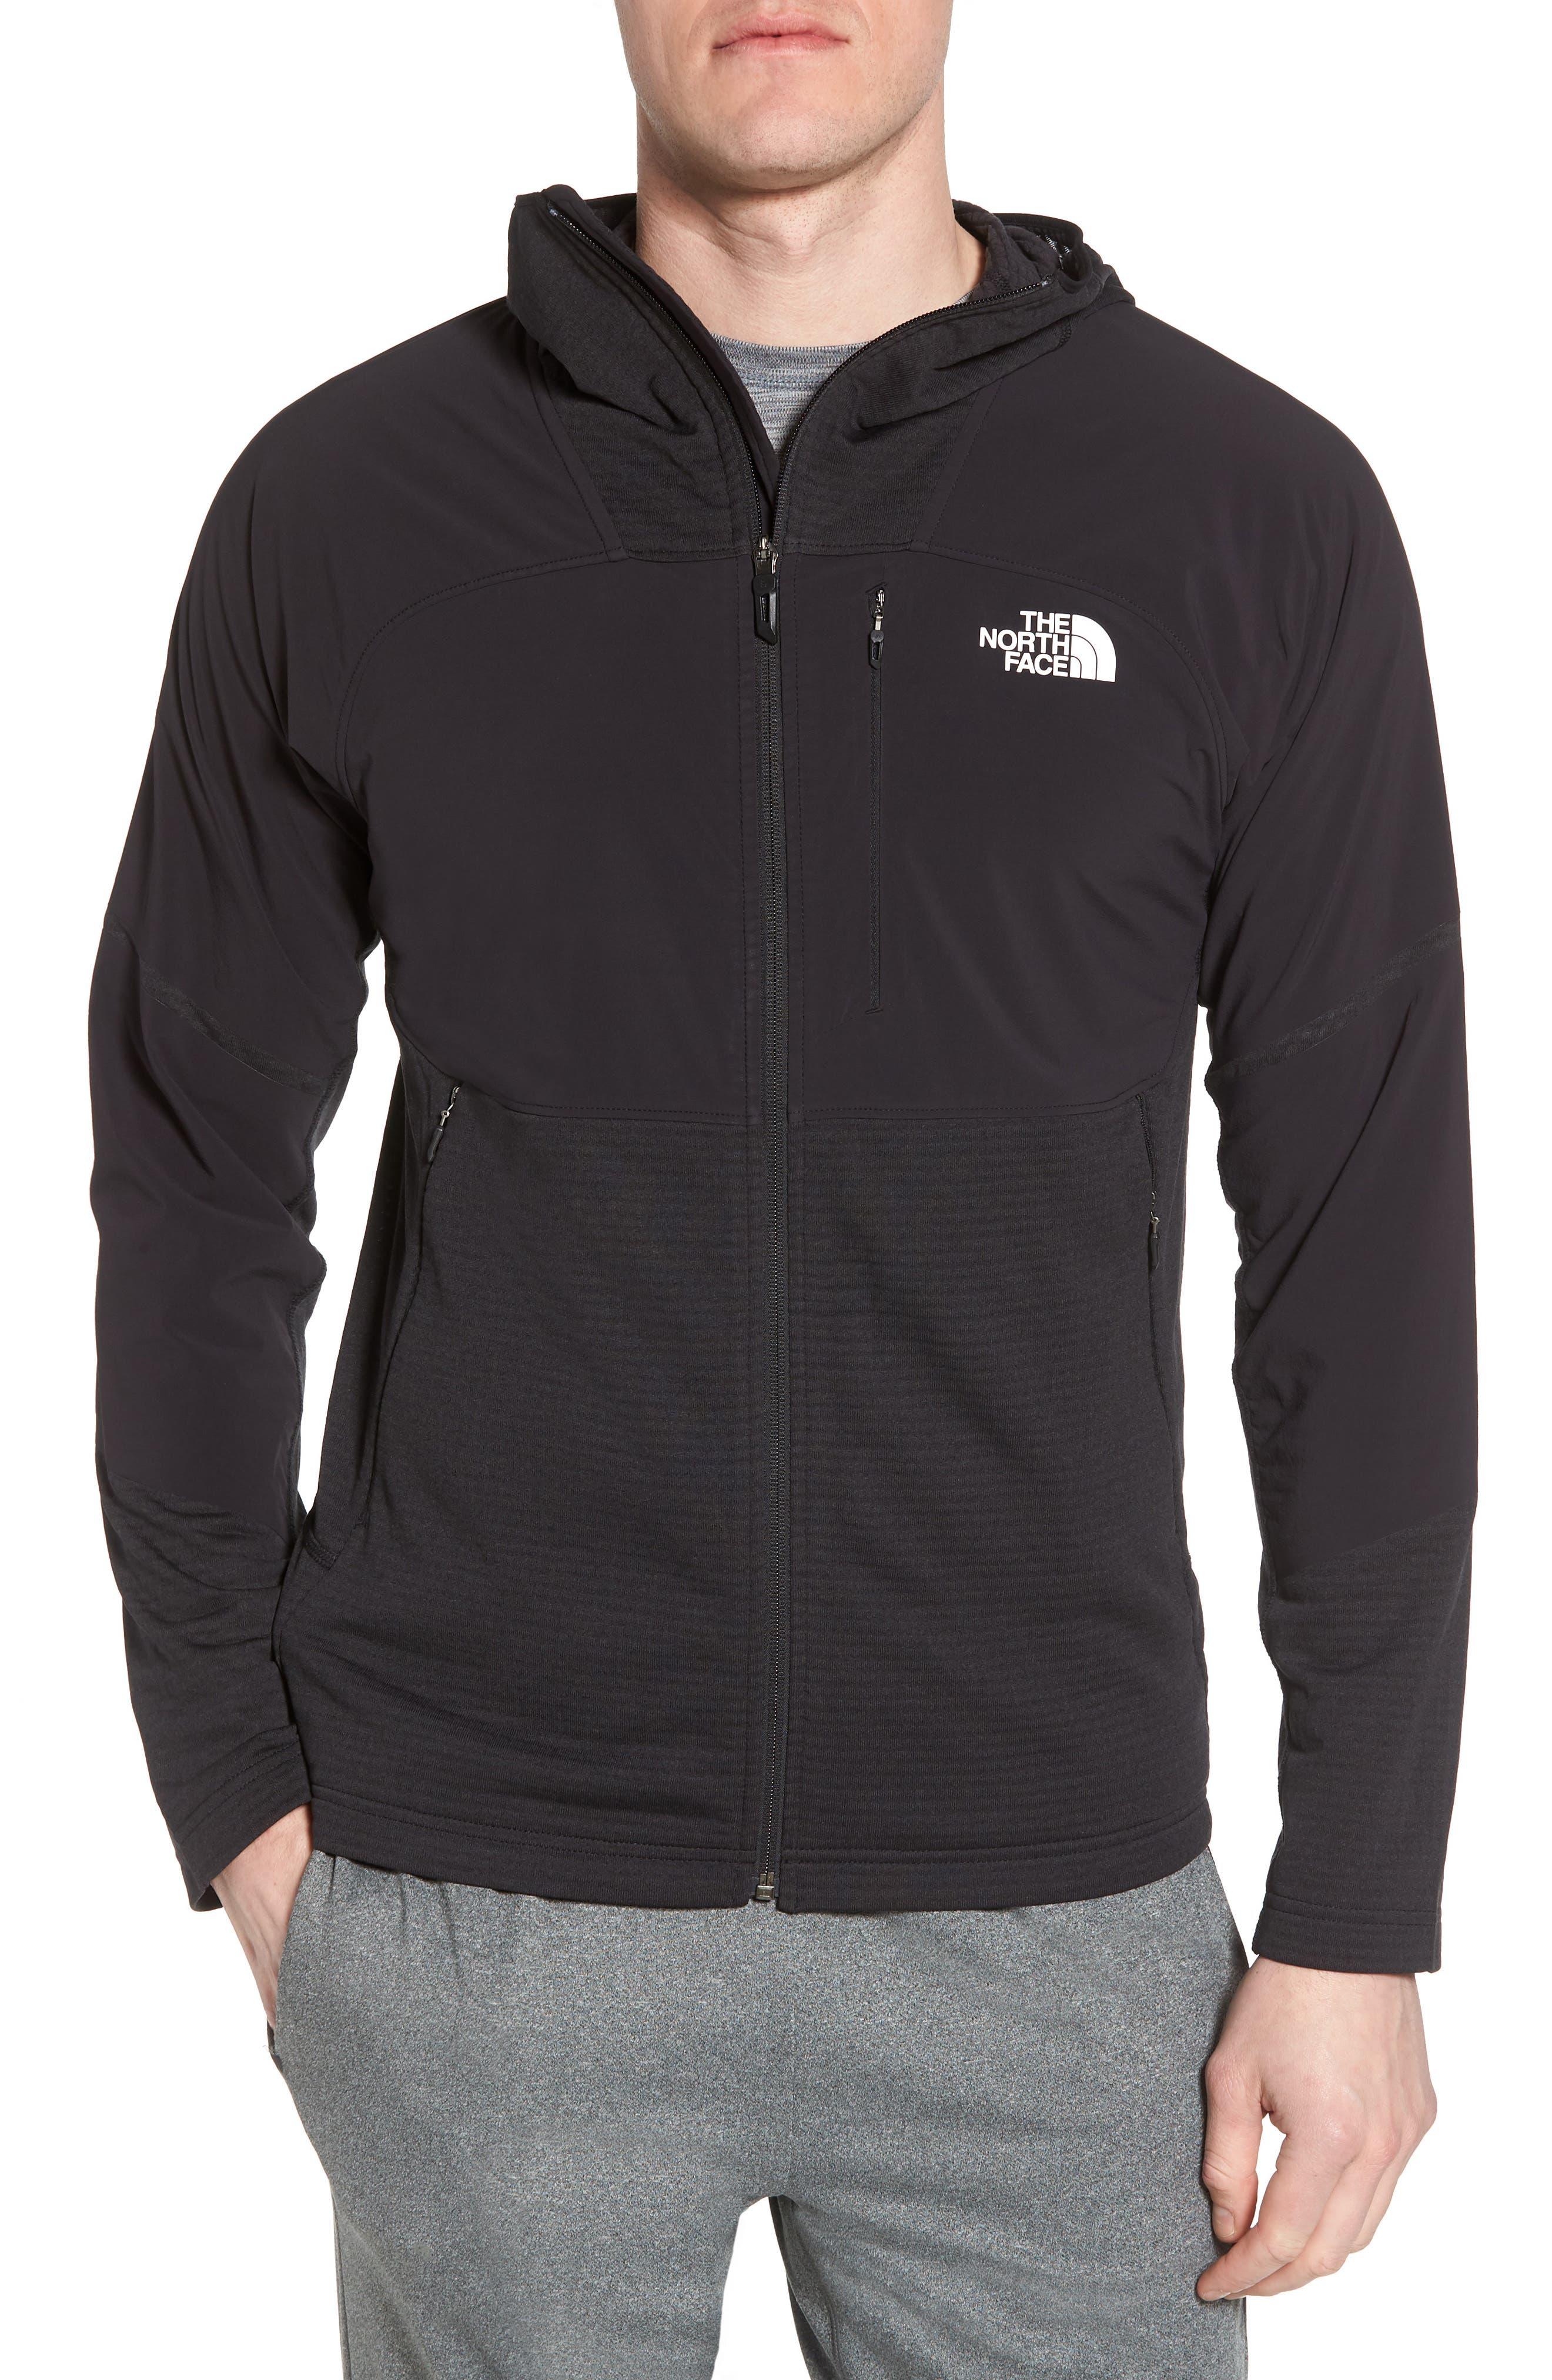 Progressor Power Grid<sup>™</sup> Hooded Fleece Jacket,                         Main,                         color, Black/ Black